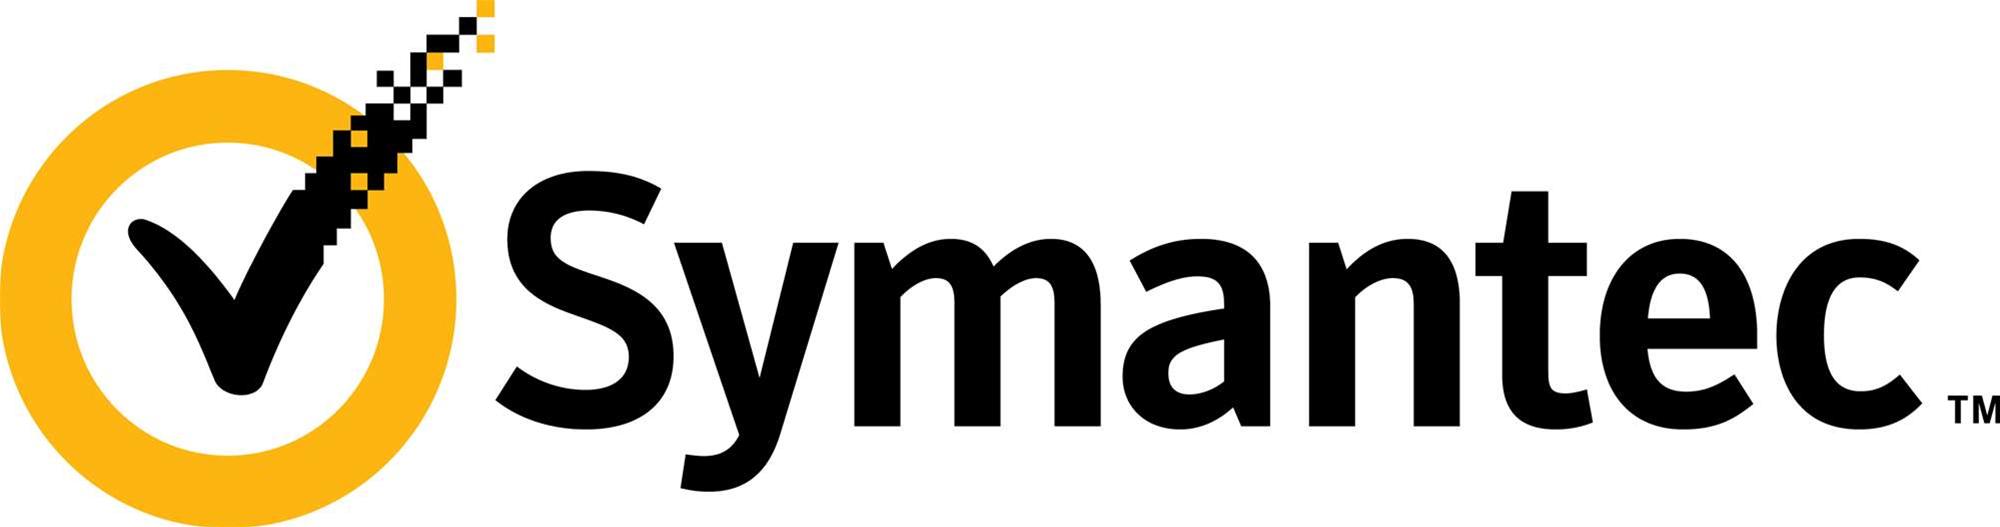 Fake Symantec site spreads OSX.Proton password stealer